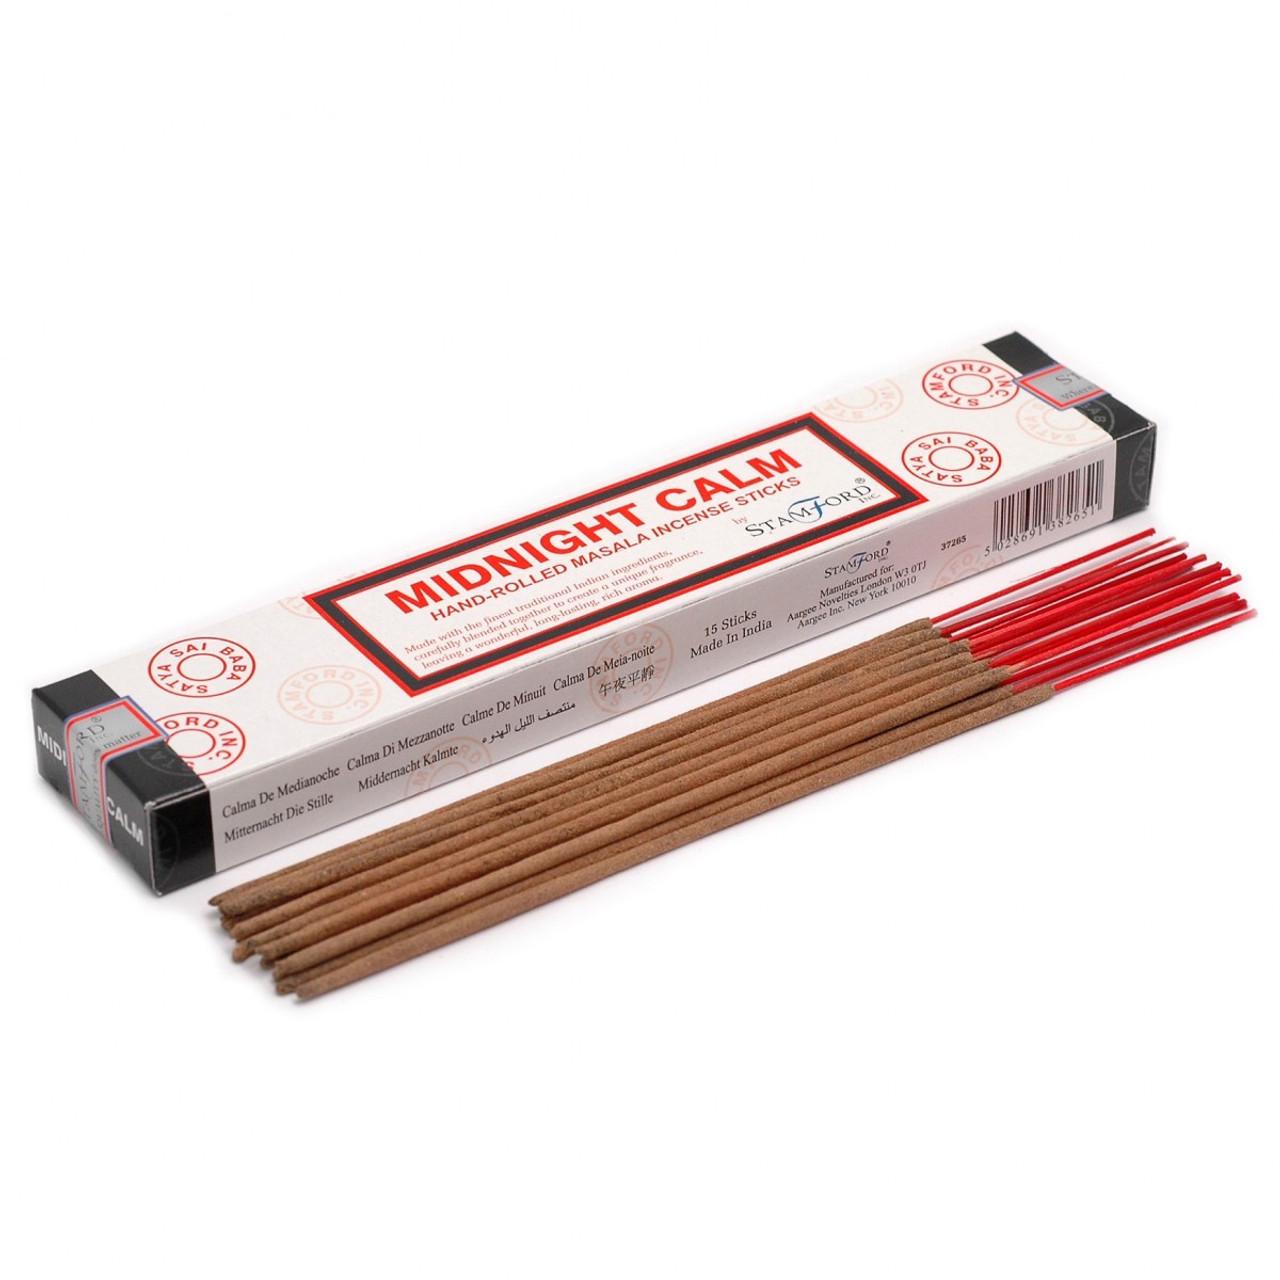 Midnight Calm Hand Rolled Masala Incense Sticks